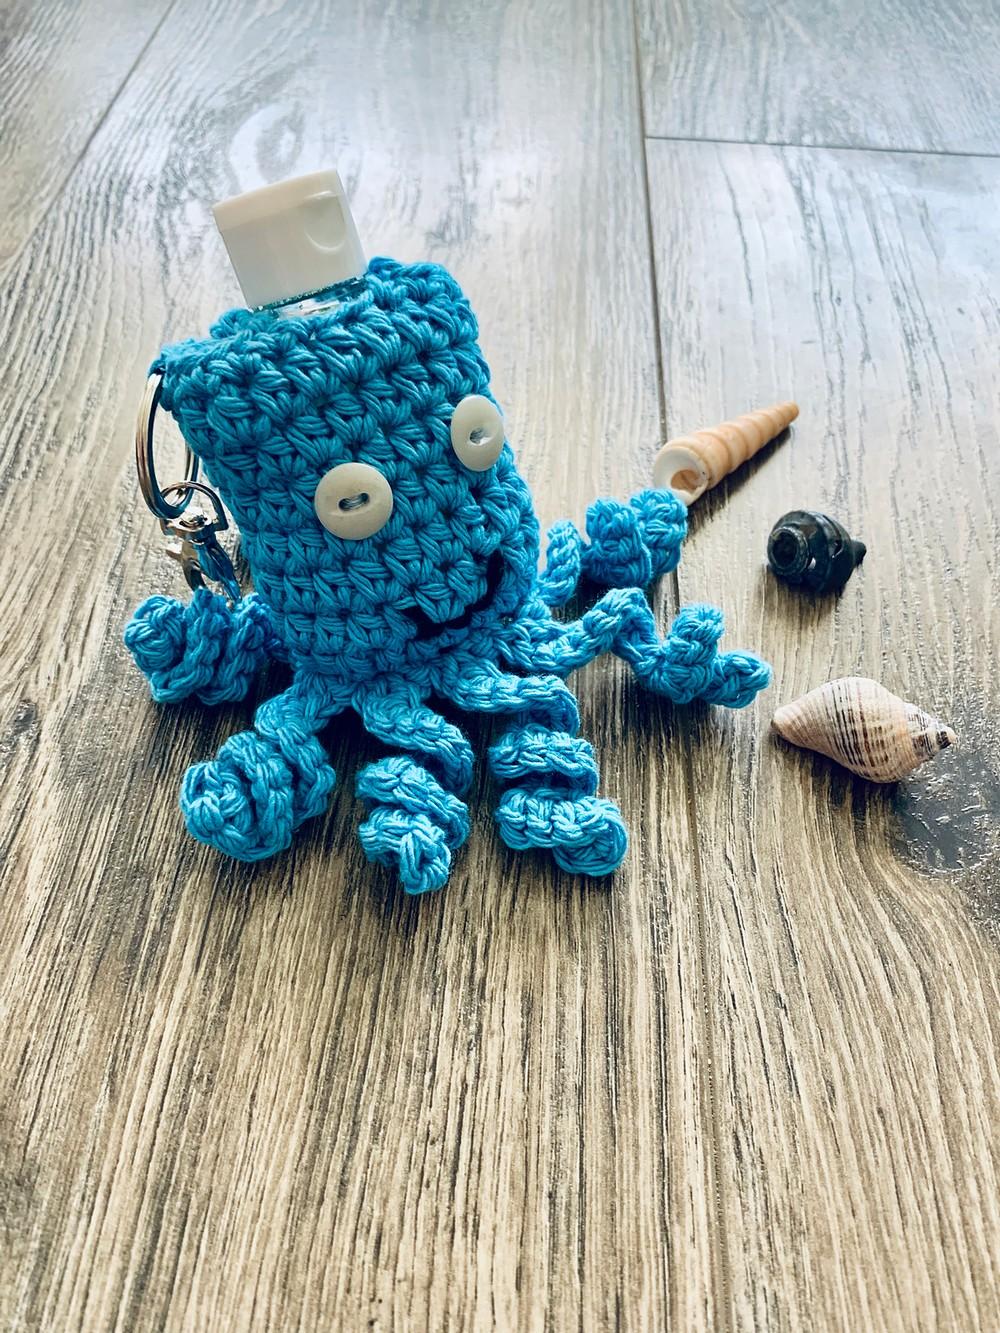 Free Crochet Handy Little Octopus Hand Sanitizer Keychain Cozy Pattern